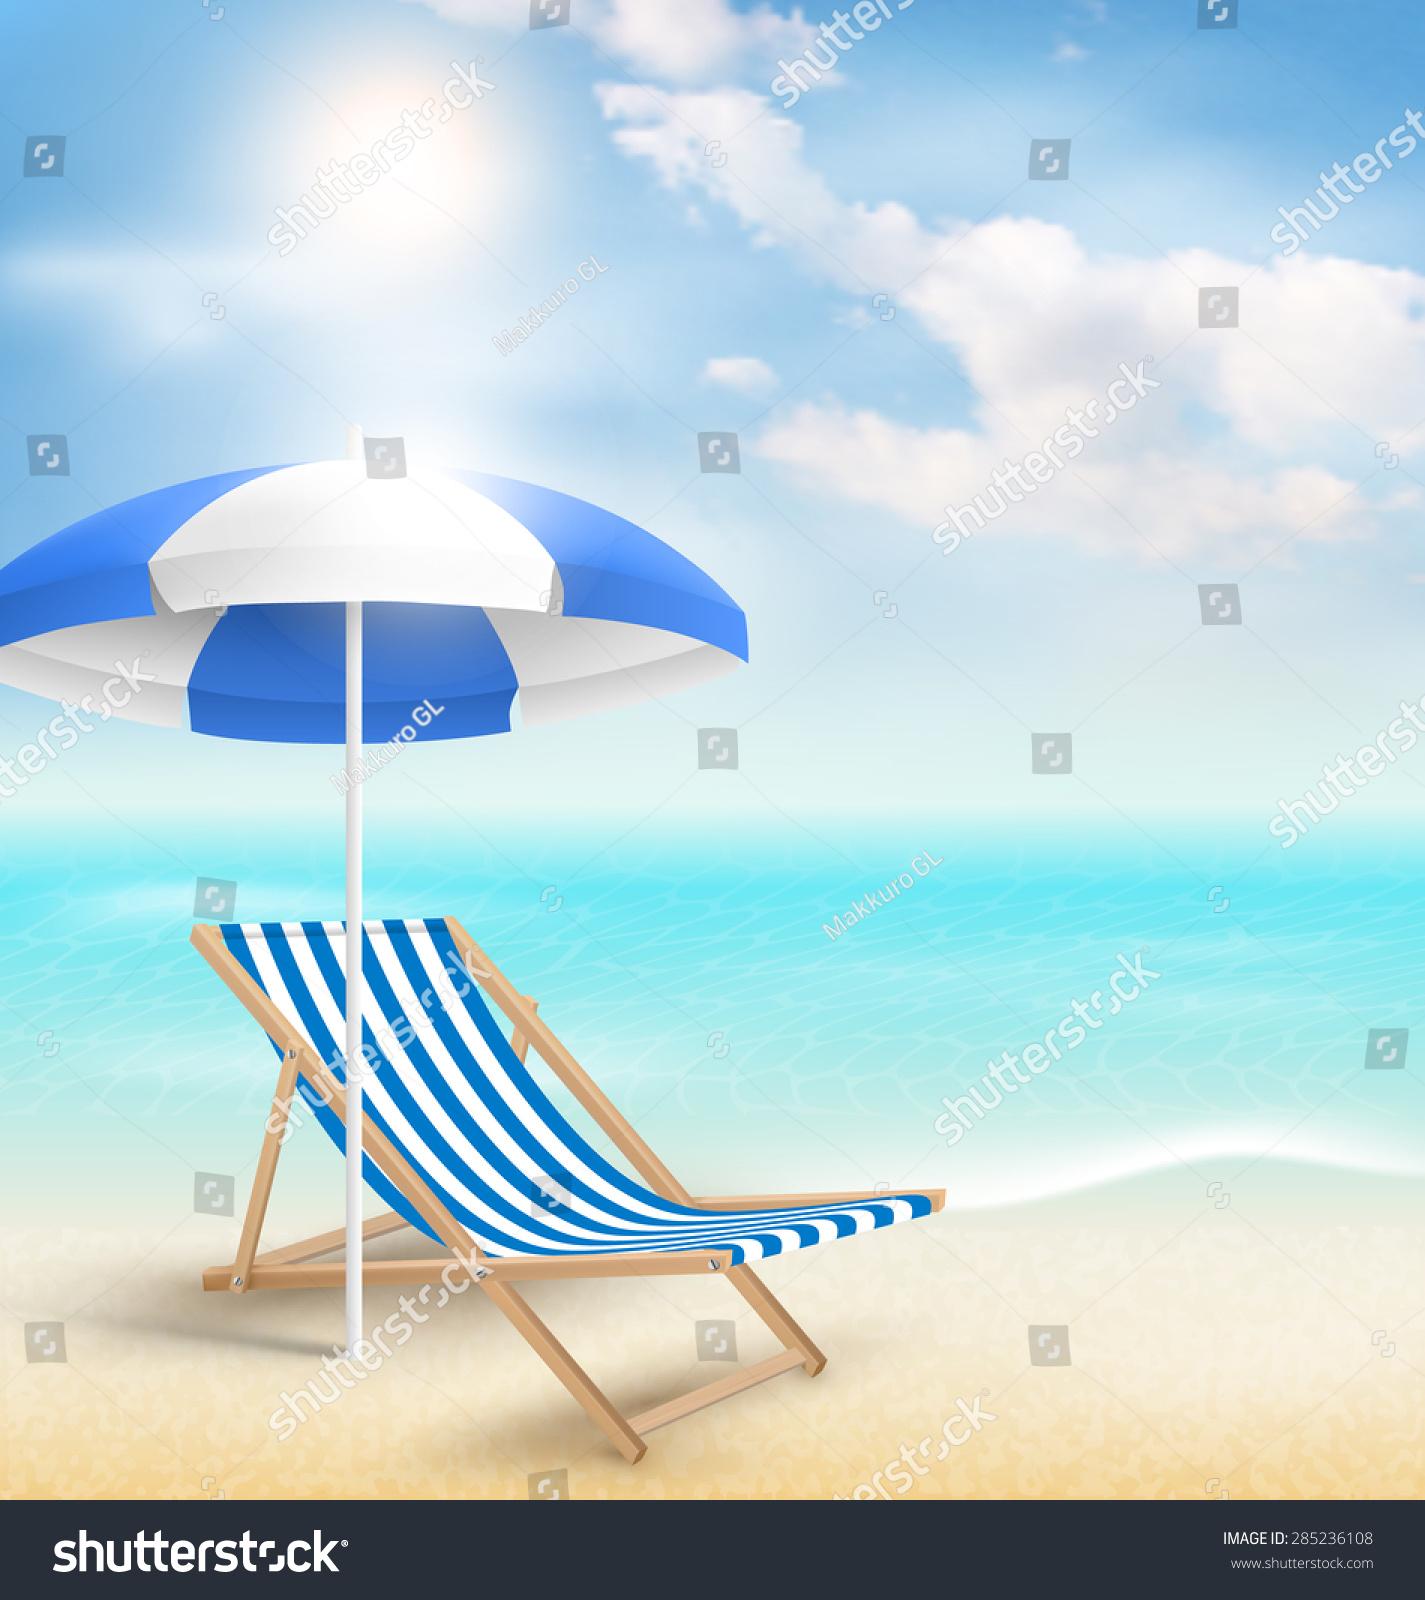 Beach Sun Beach Umbrella Beach Chair Stock Vector